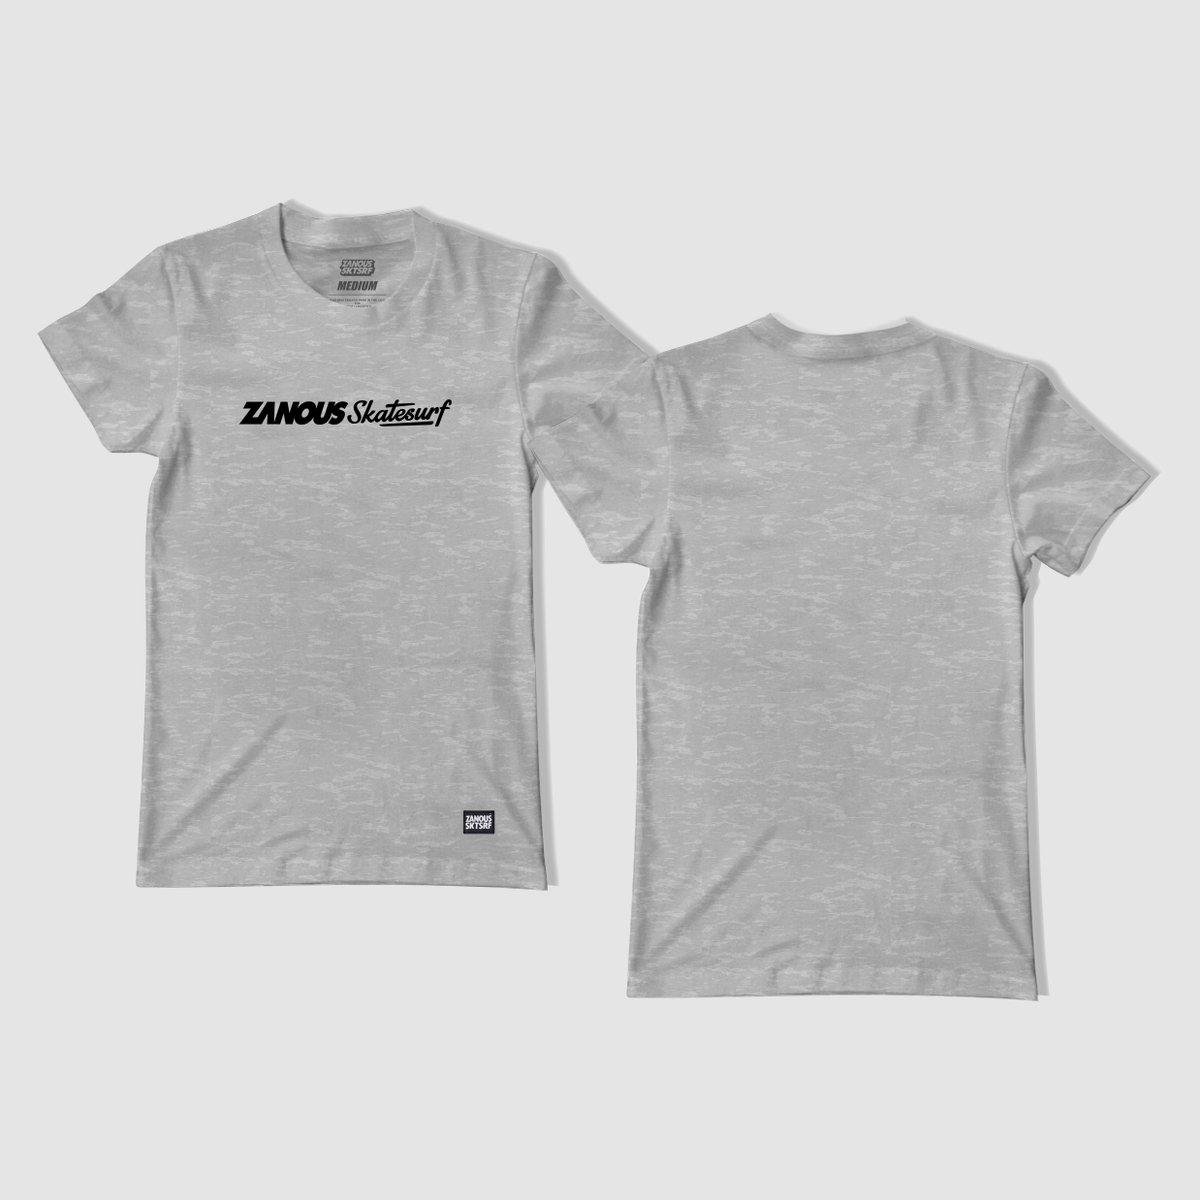 T-Shirt. Material : Cotton 30s Price : 125.000 . For order please contact : Wa : 082214180880 Shopee : Zuldazanous #zanousgangs #distrobandung #fashion #ootd #pants #skate #surf #jakarta #makasar #jepara #kuduspic.twitter.com/SMvQnwAbYj